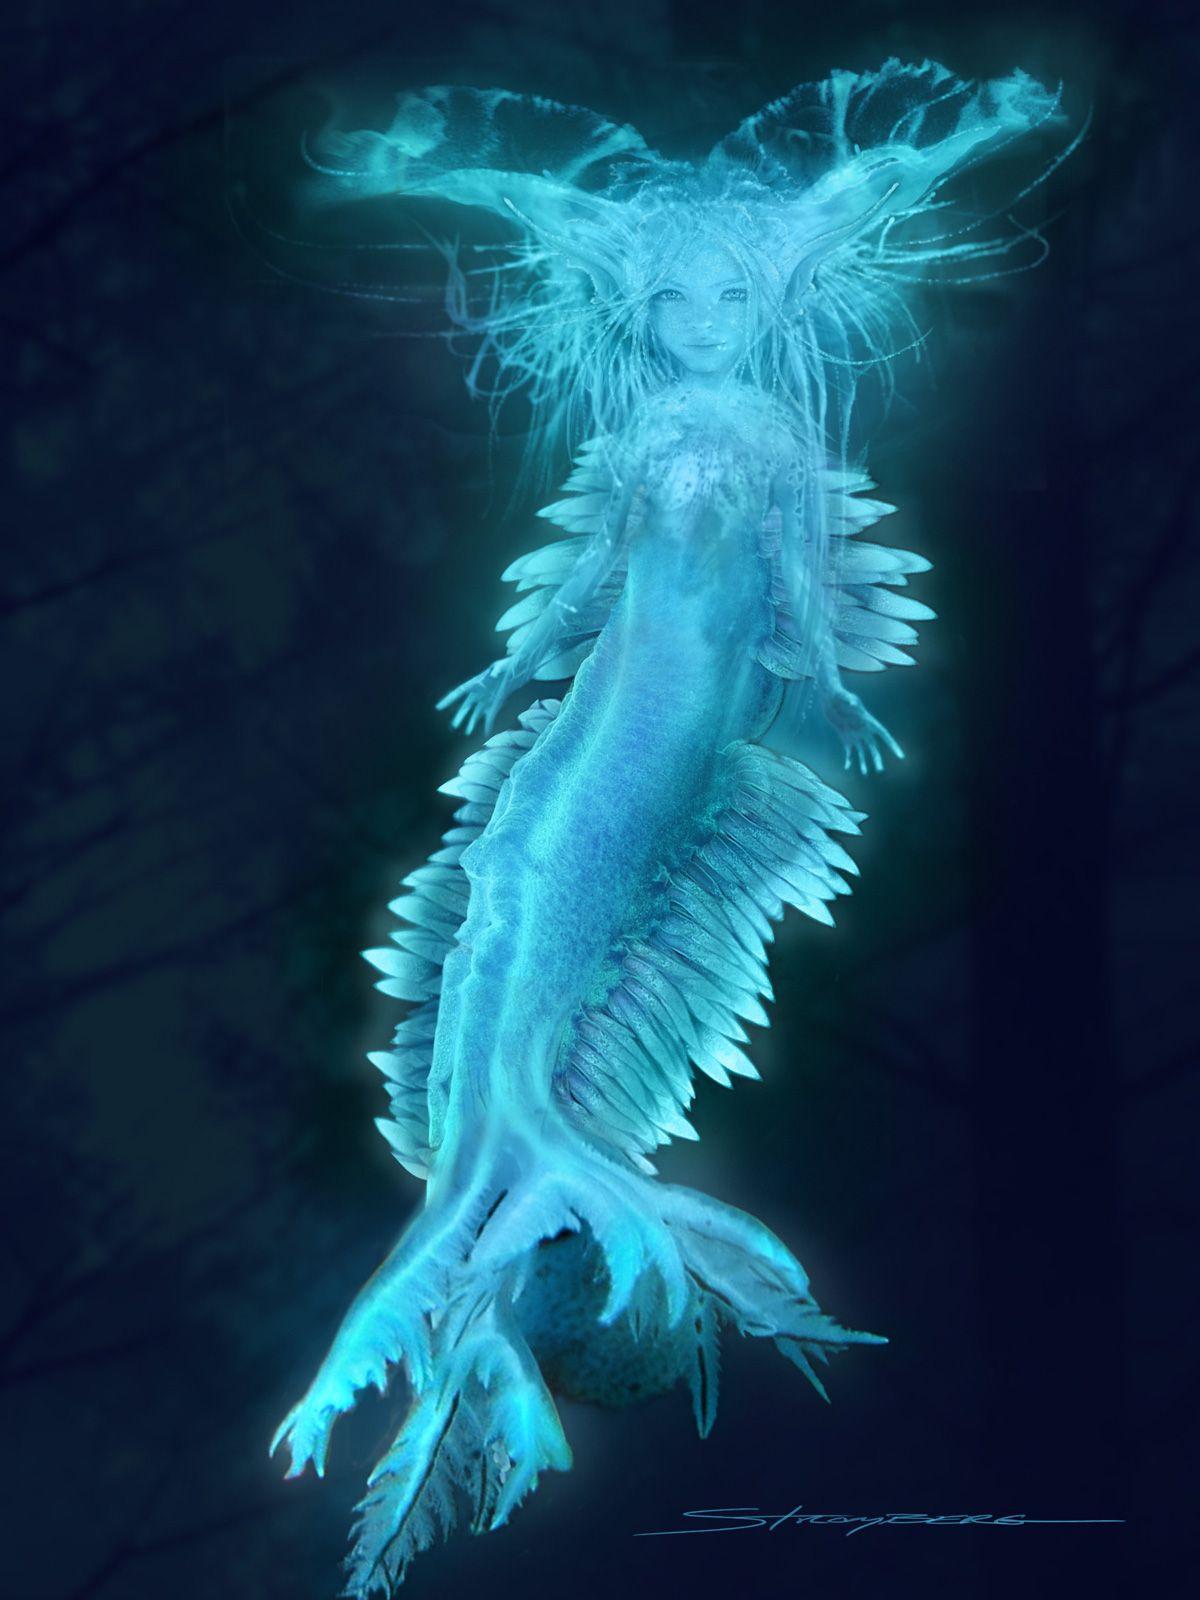 Water sprite creature